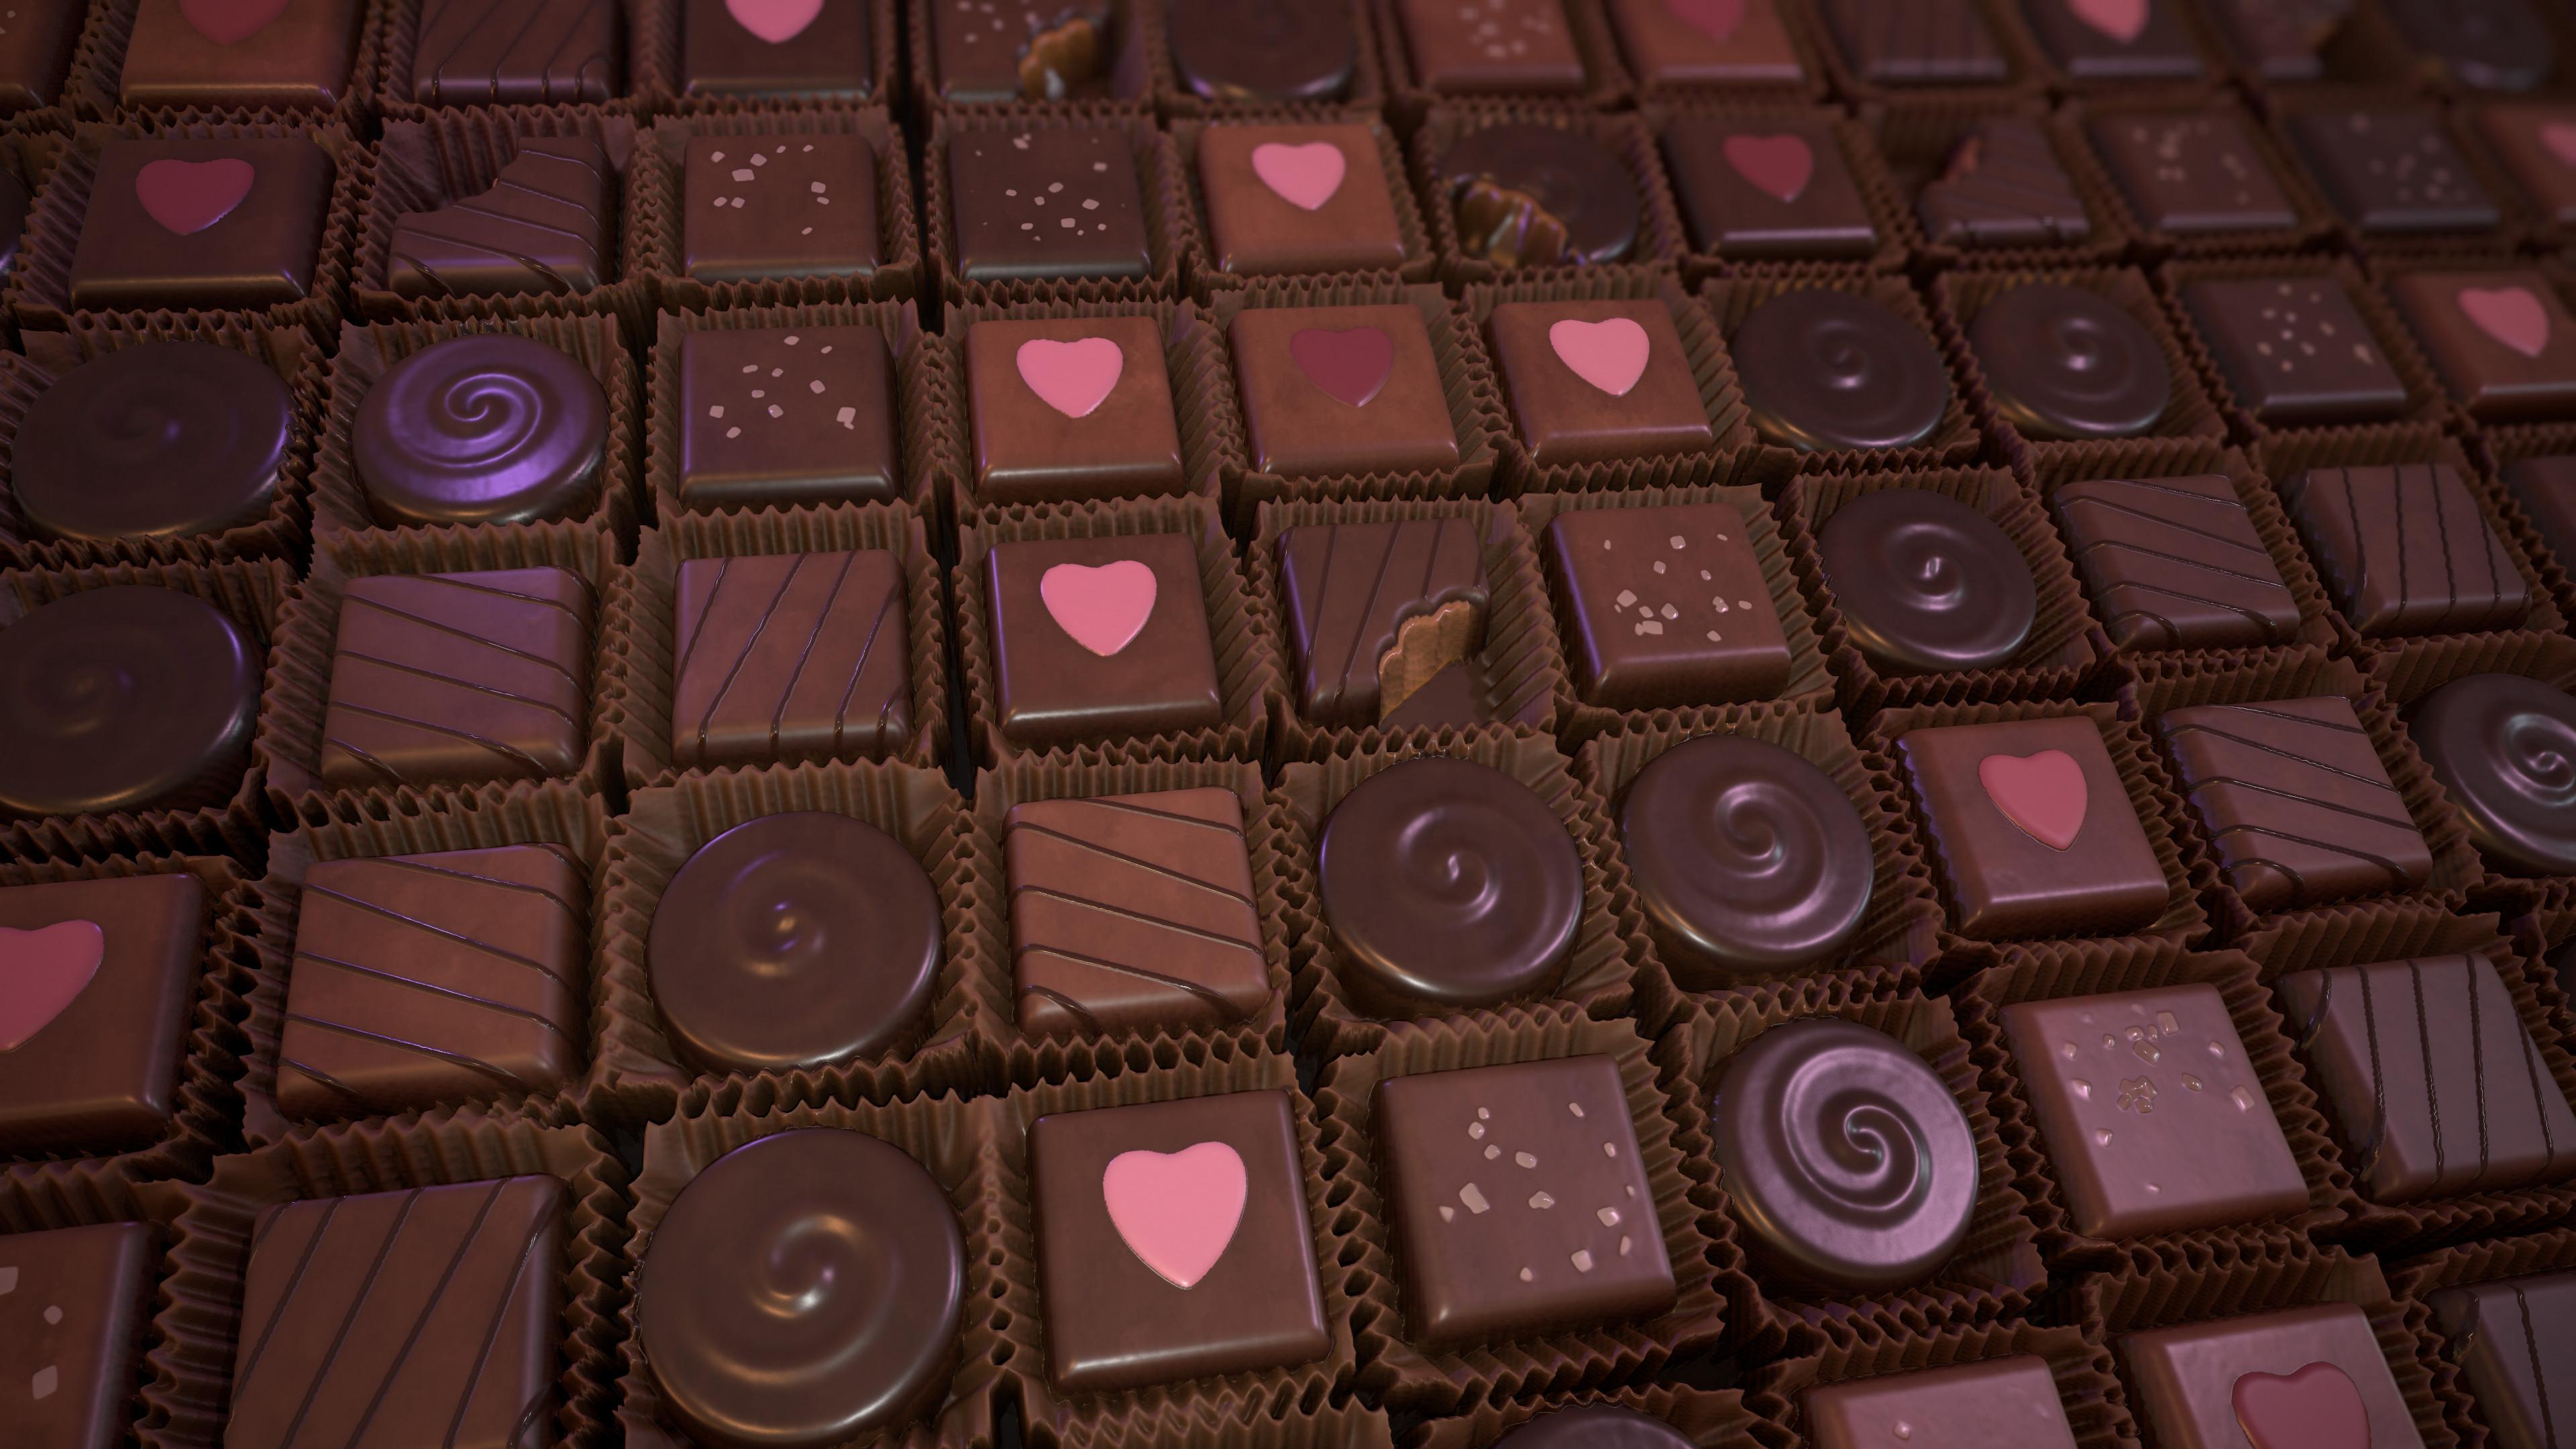 Planar Render of Chocolate material